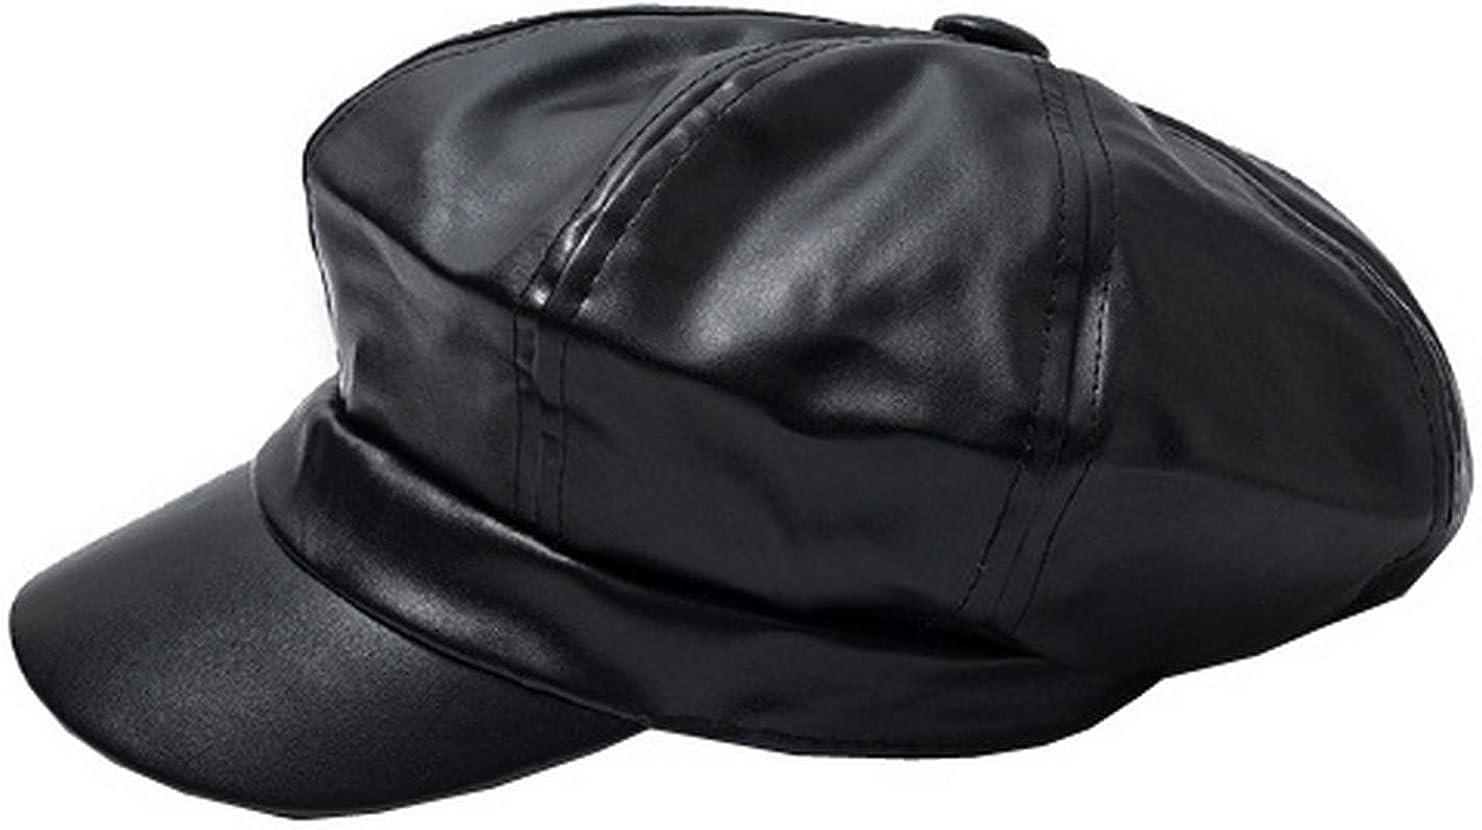 Women Topics on TV PU Leather Newsboy Cabbie Peaked Vintage B Baker Cap Beret Credence